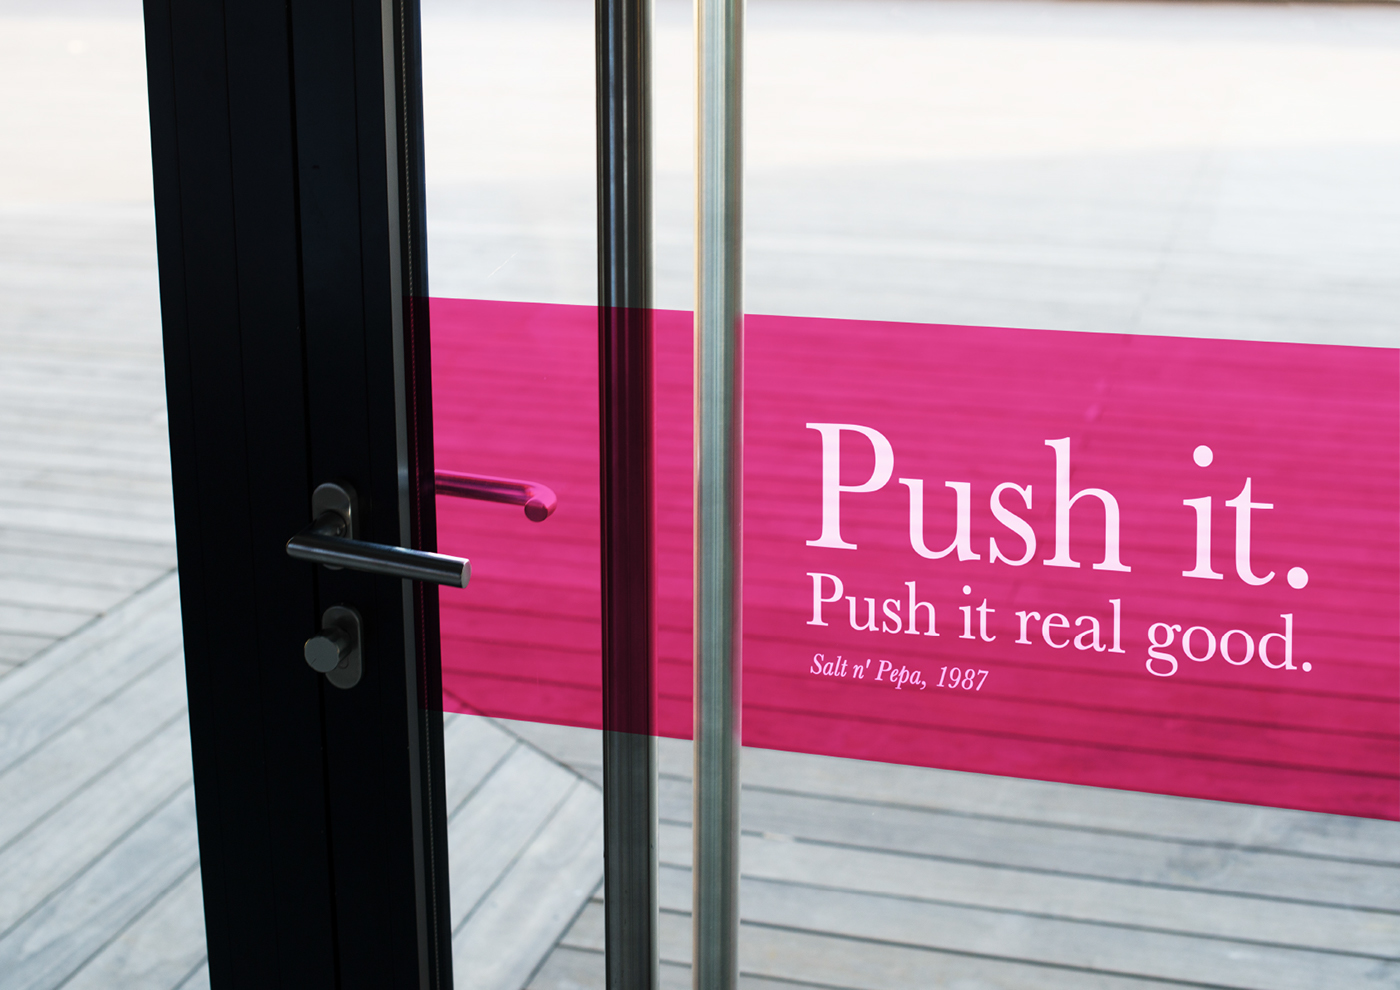 guidance system hotel berlin nhow orientation wayfinding Signage